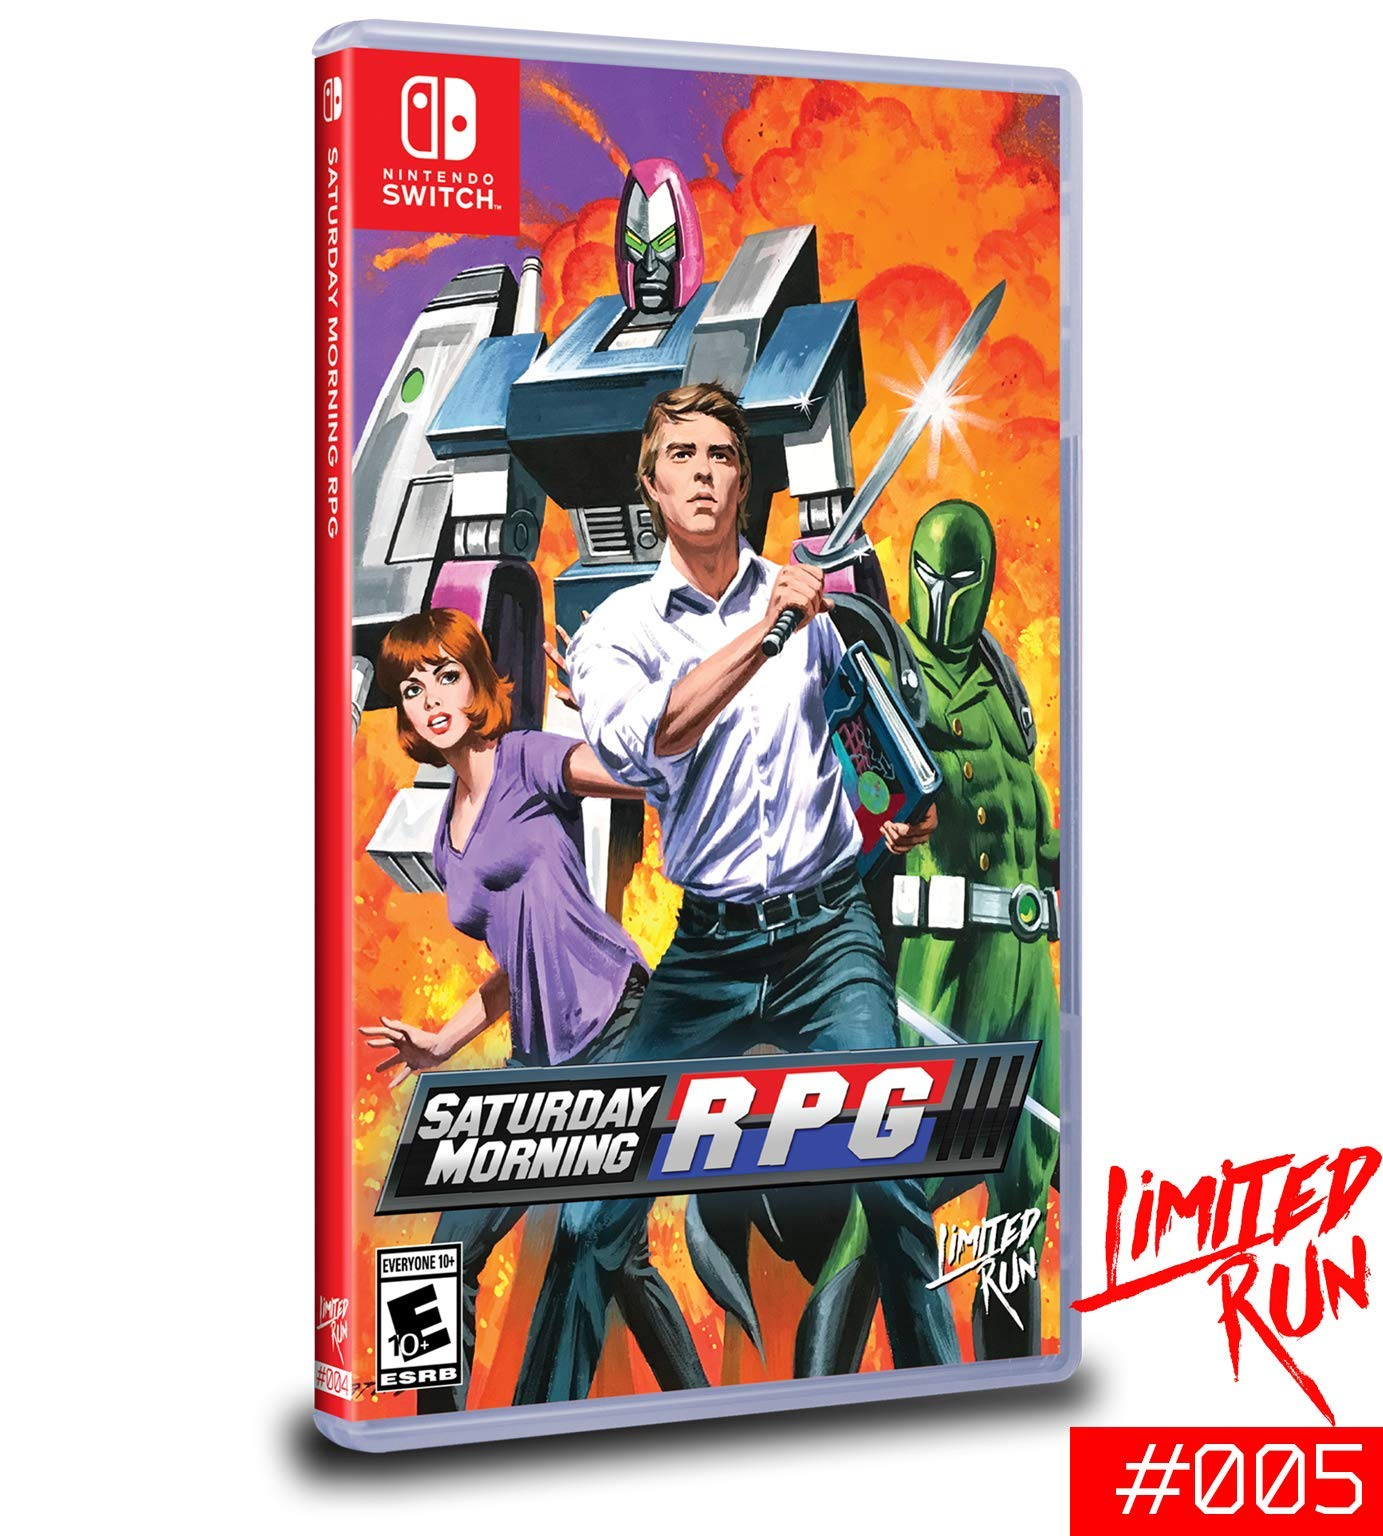 Amazon com: Saturday Morning RPG - Nintendo Switch (Limited Run